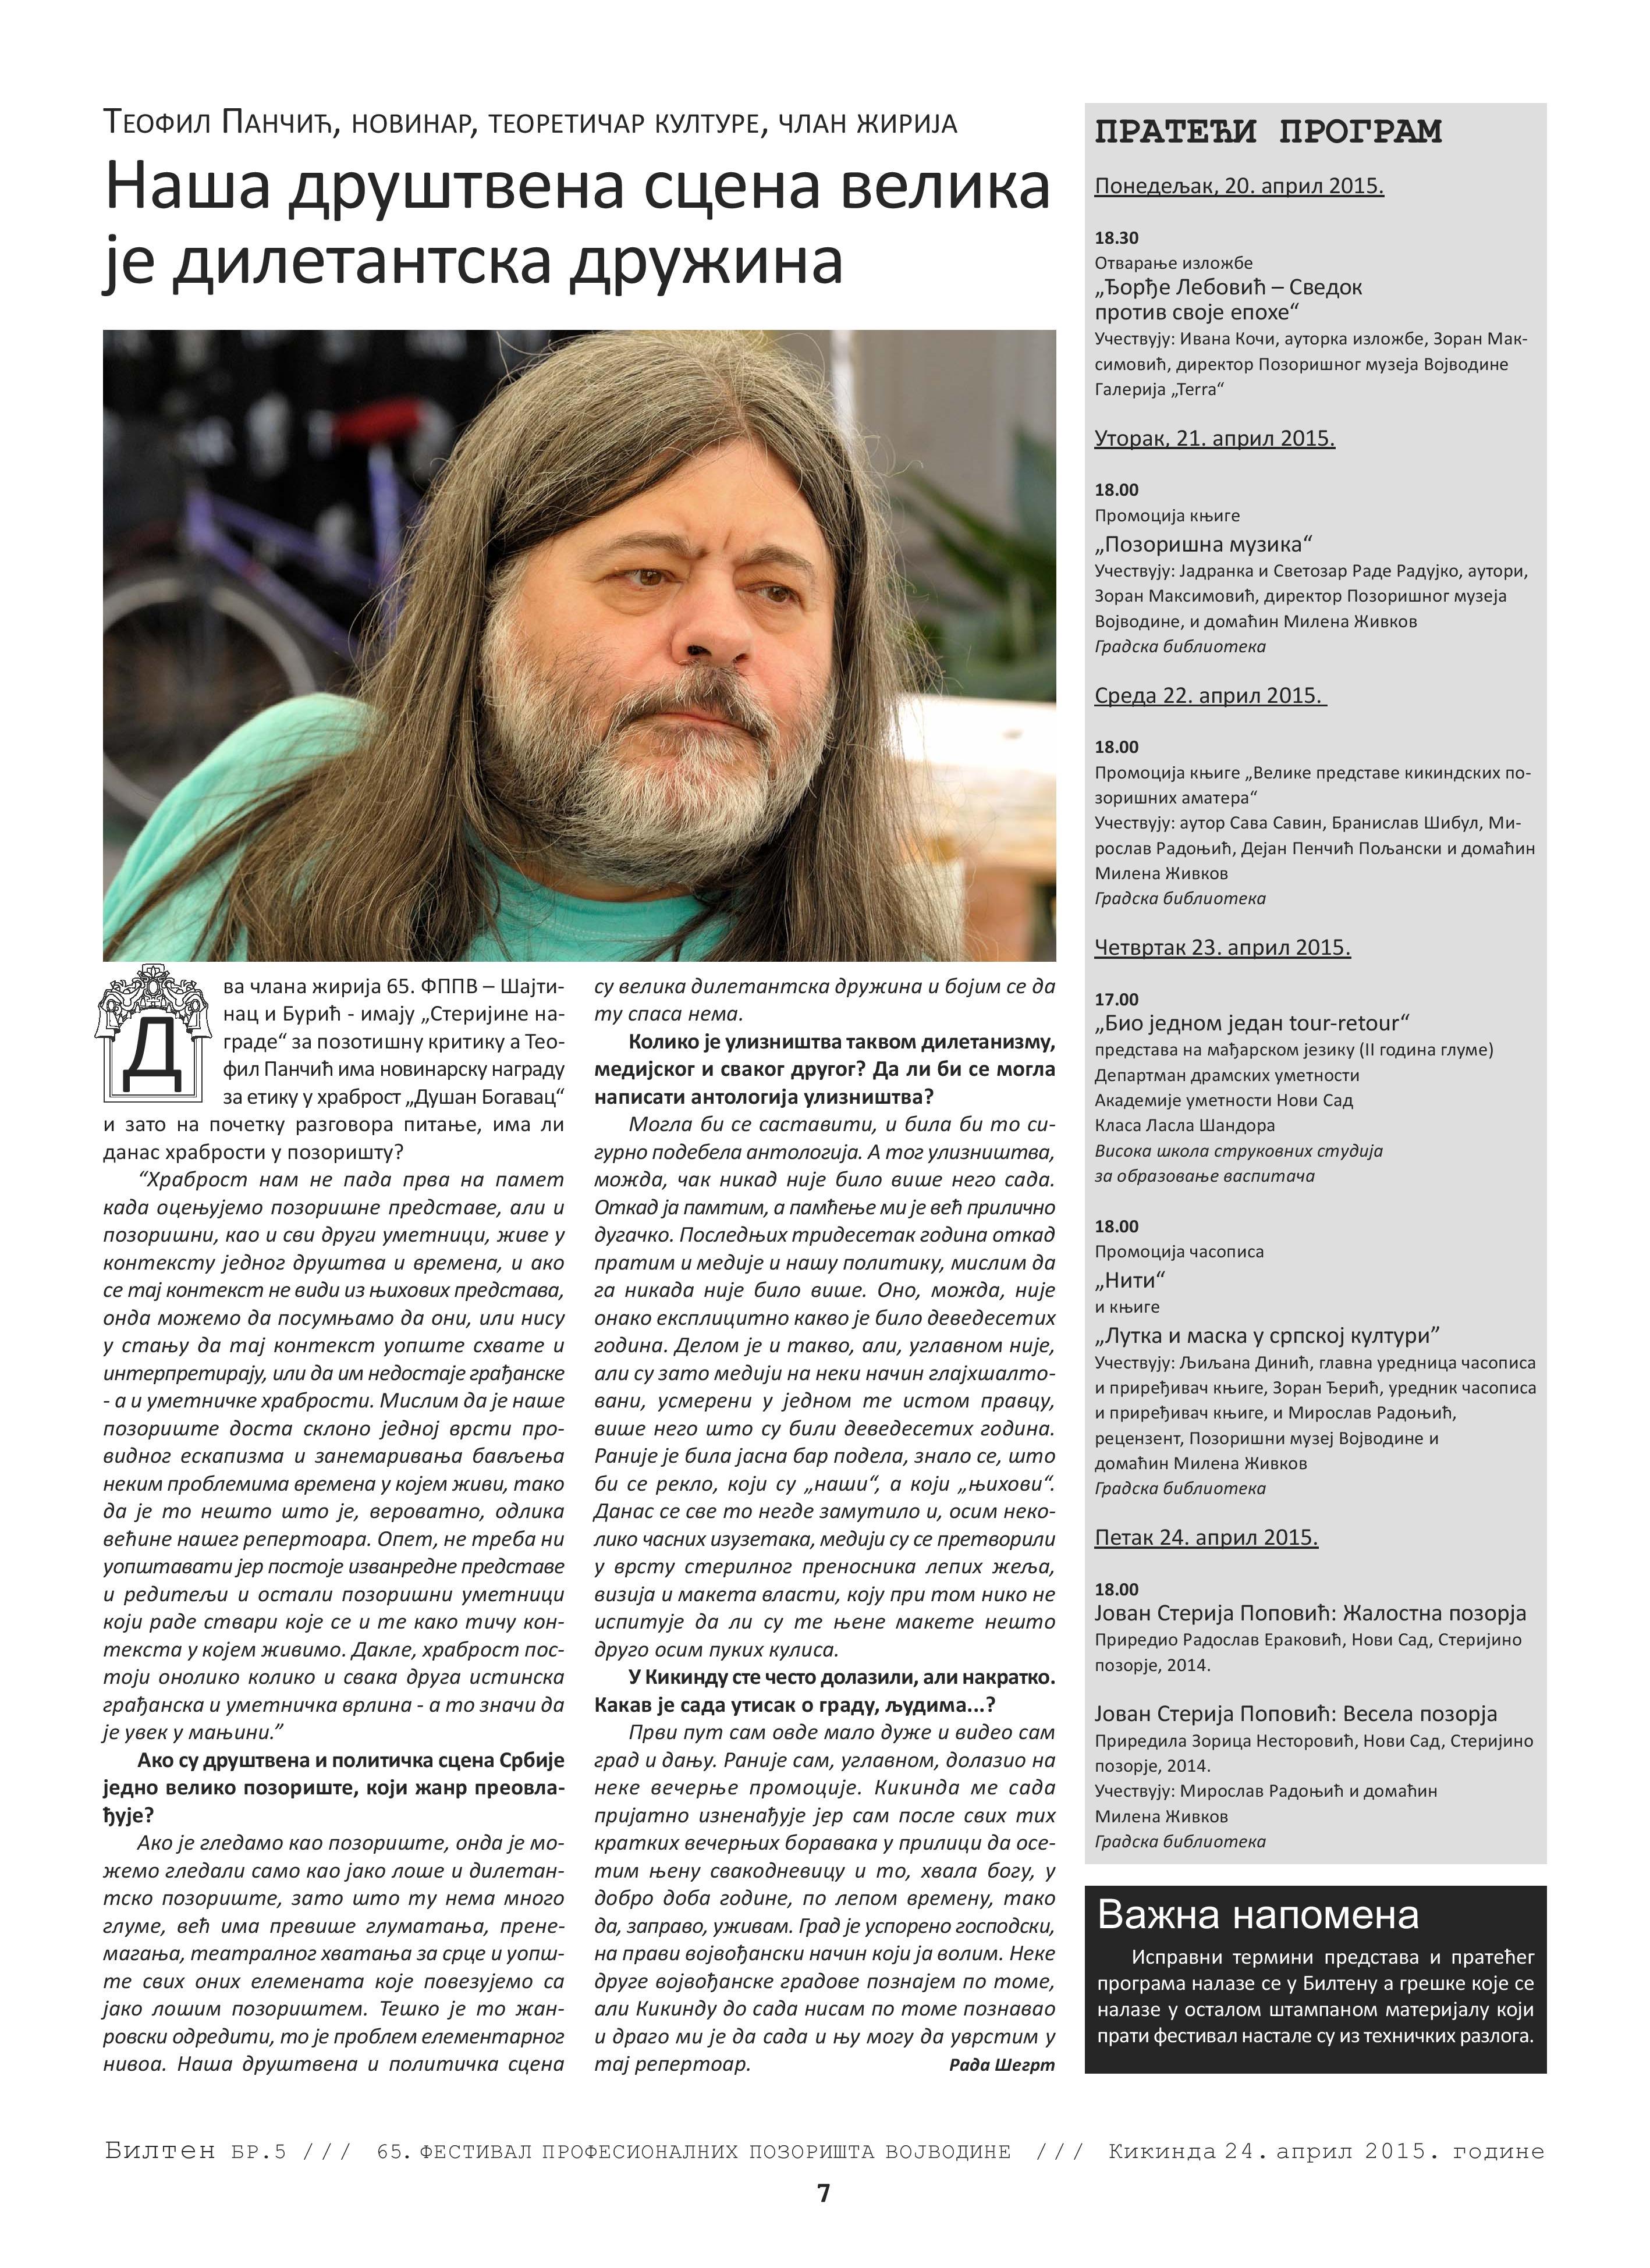 BILTEN_05_24 april-page-007